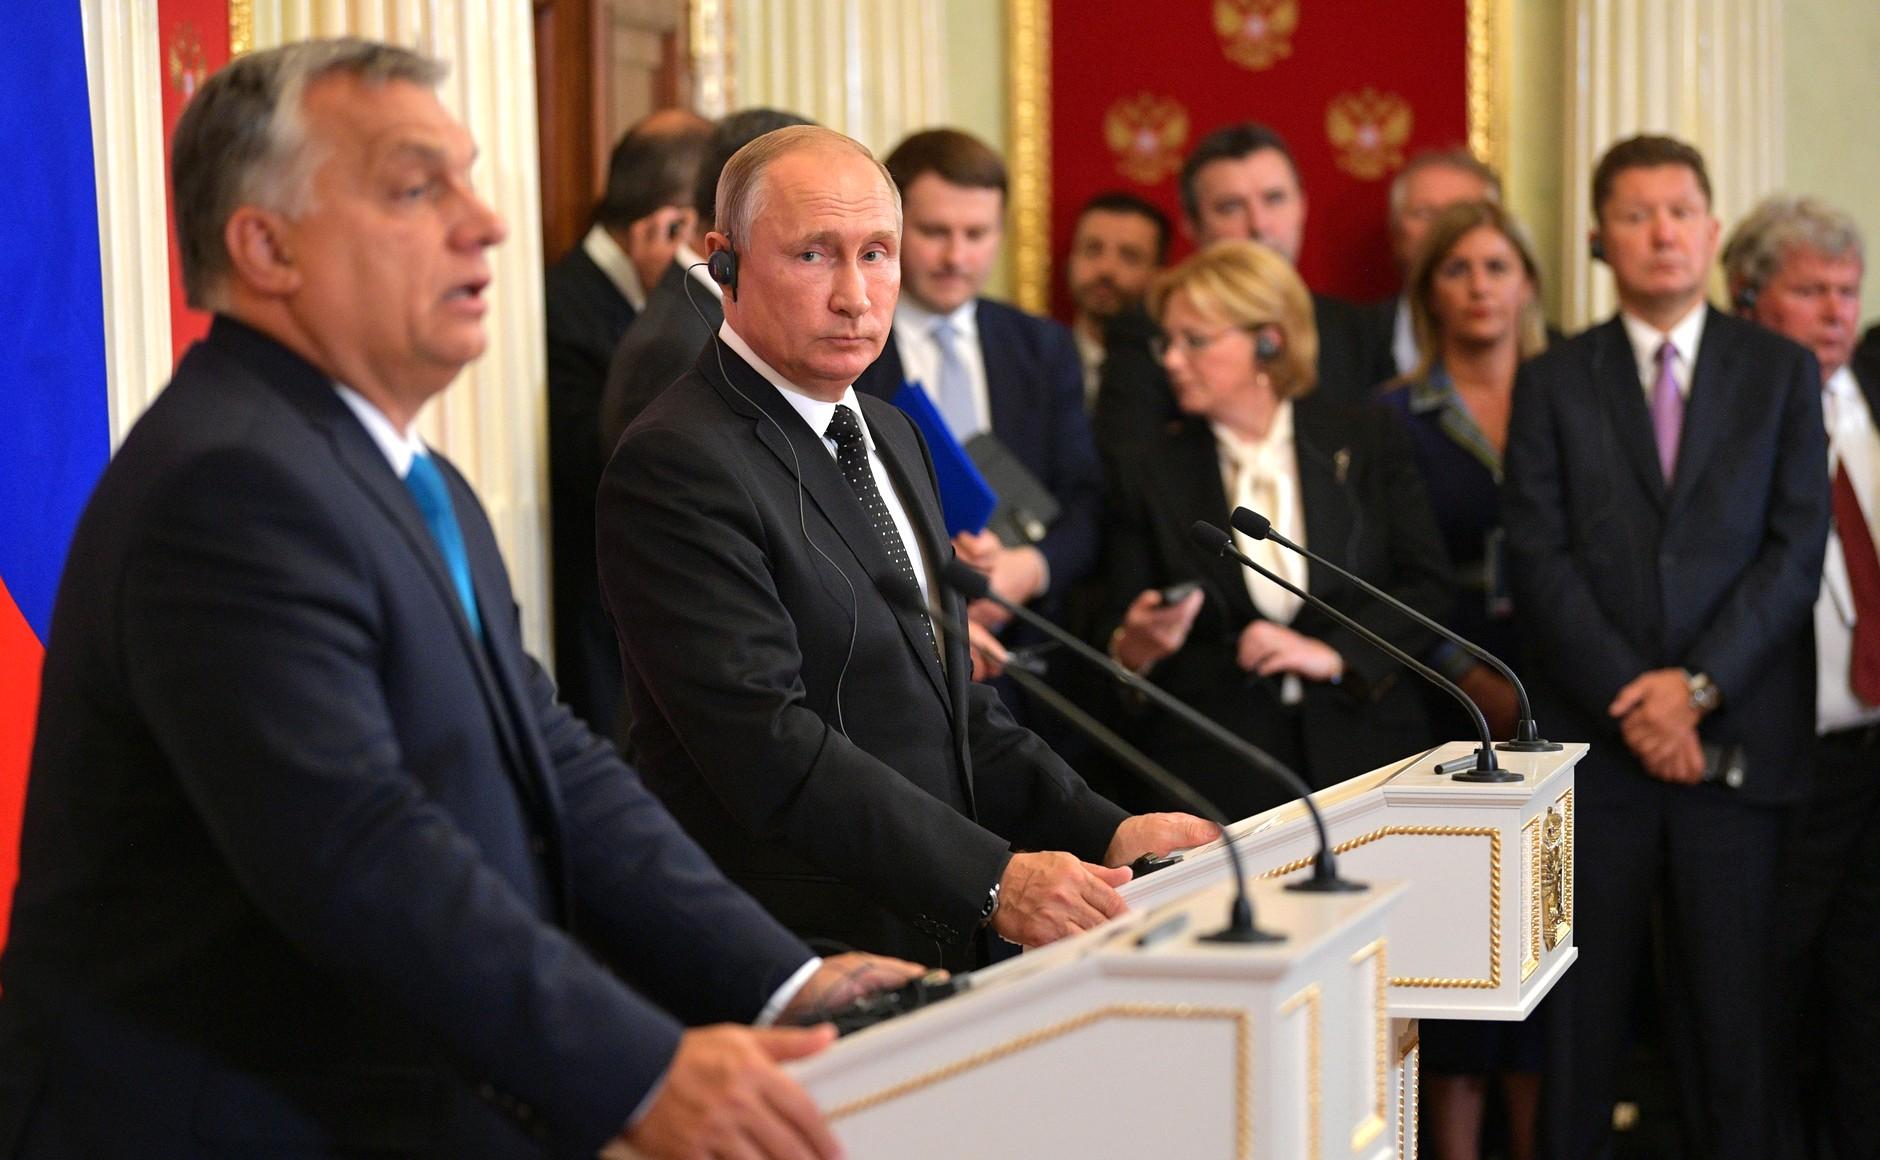 http://en.kremlin.ru